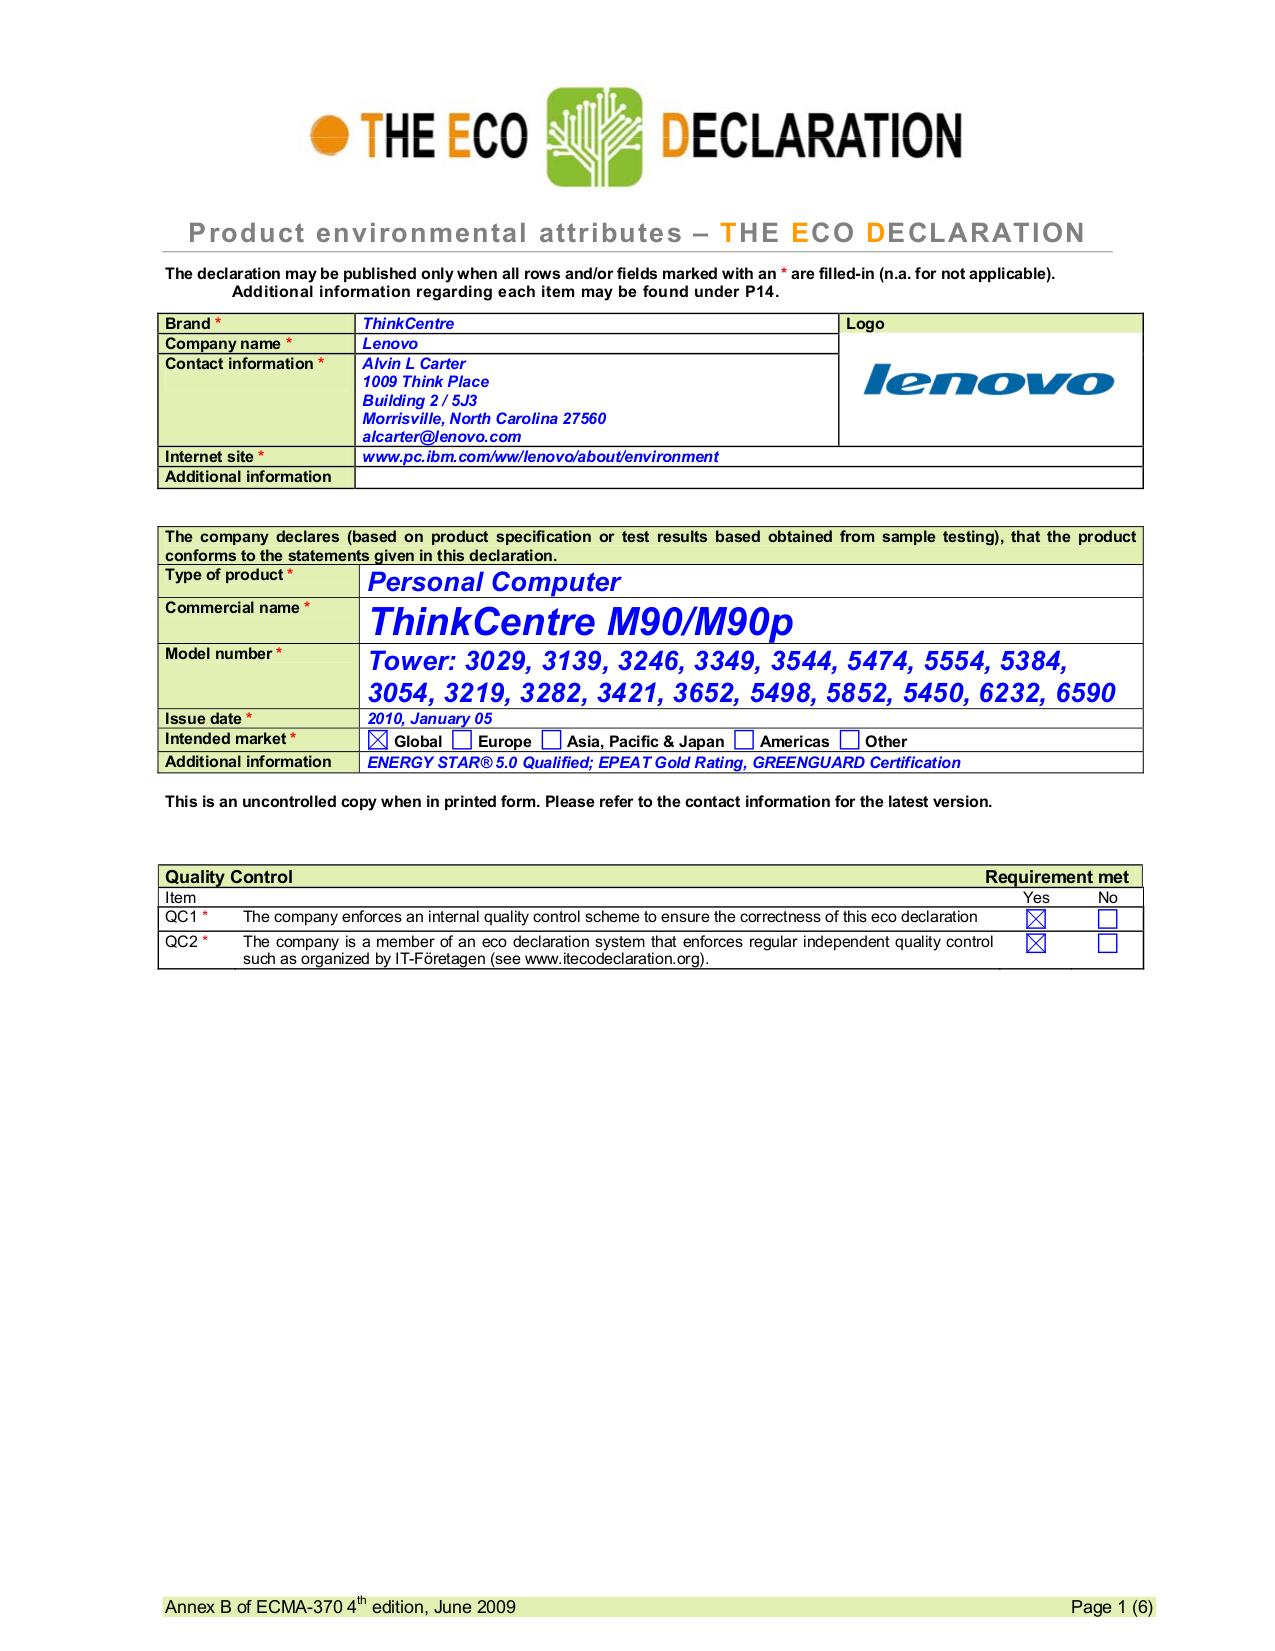 pdf for Lenovo Desktop ThinkCentre M90 5474 manual